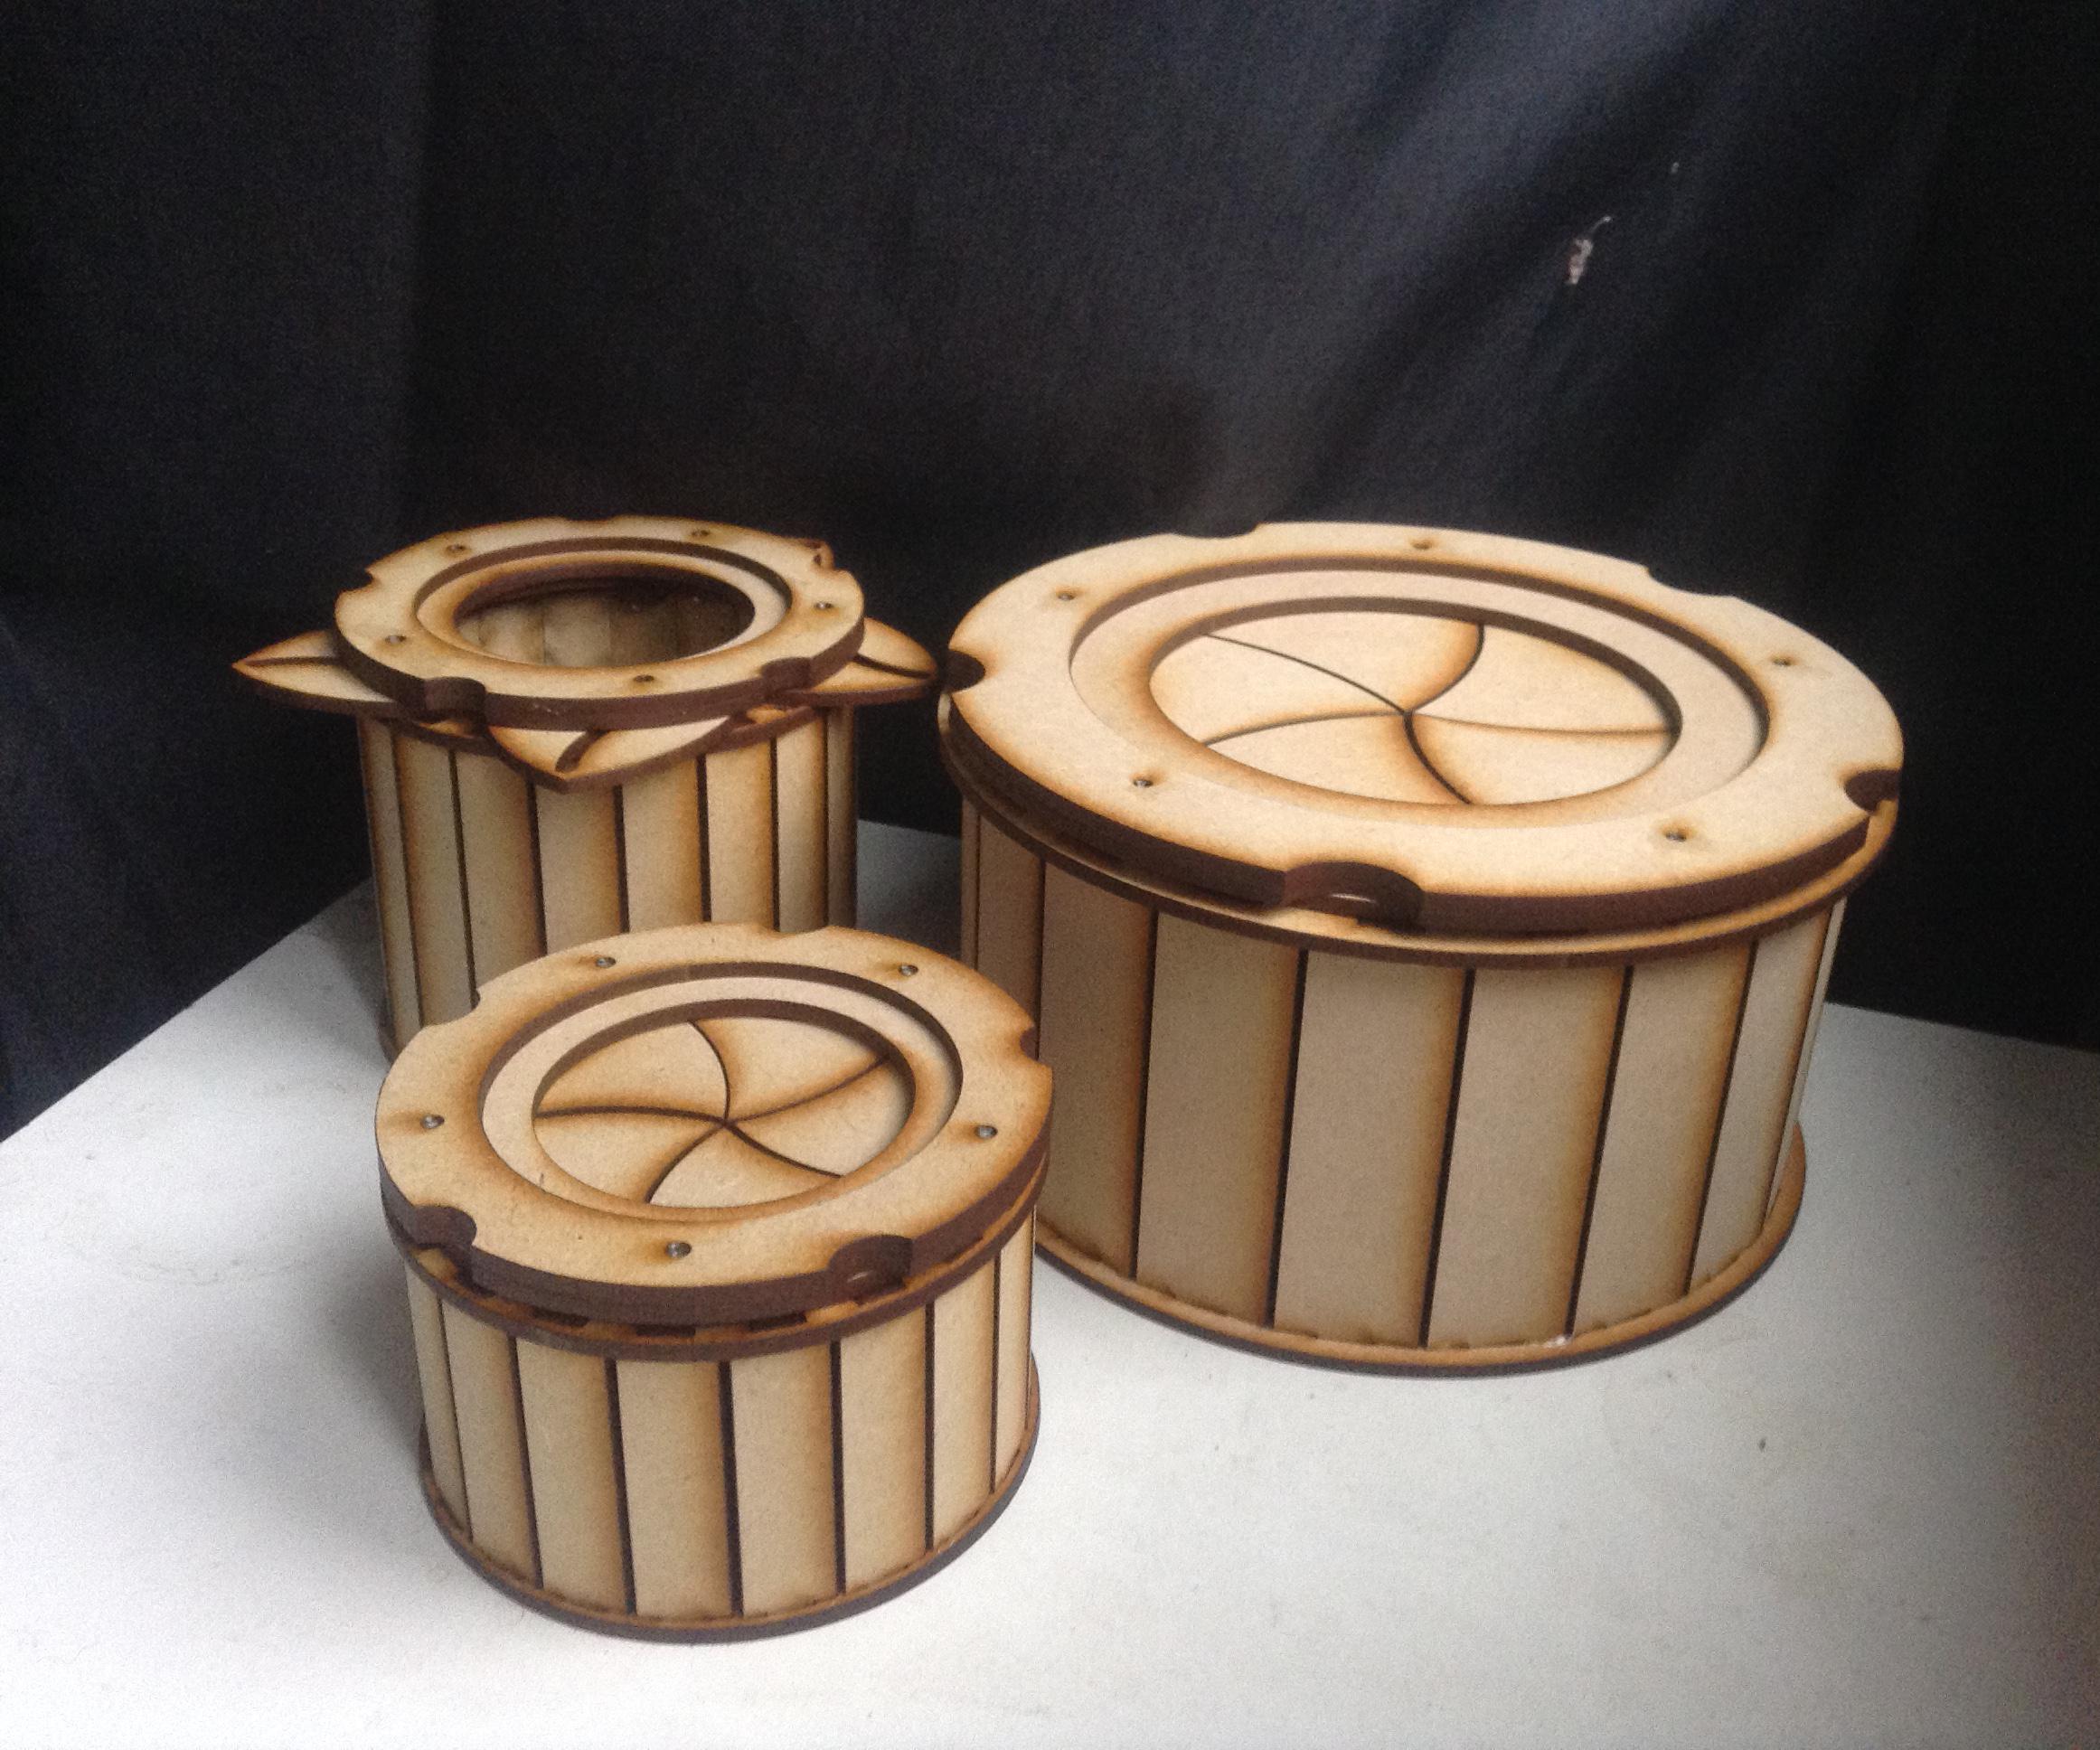 3D Printed 5-Petal Iris Box